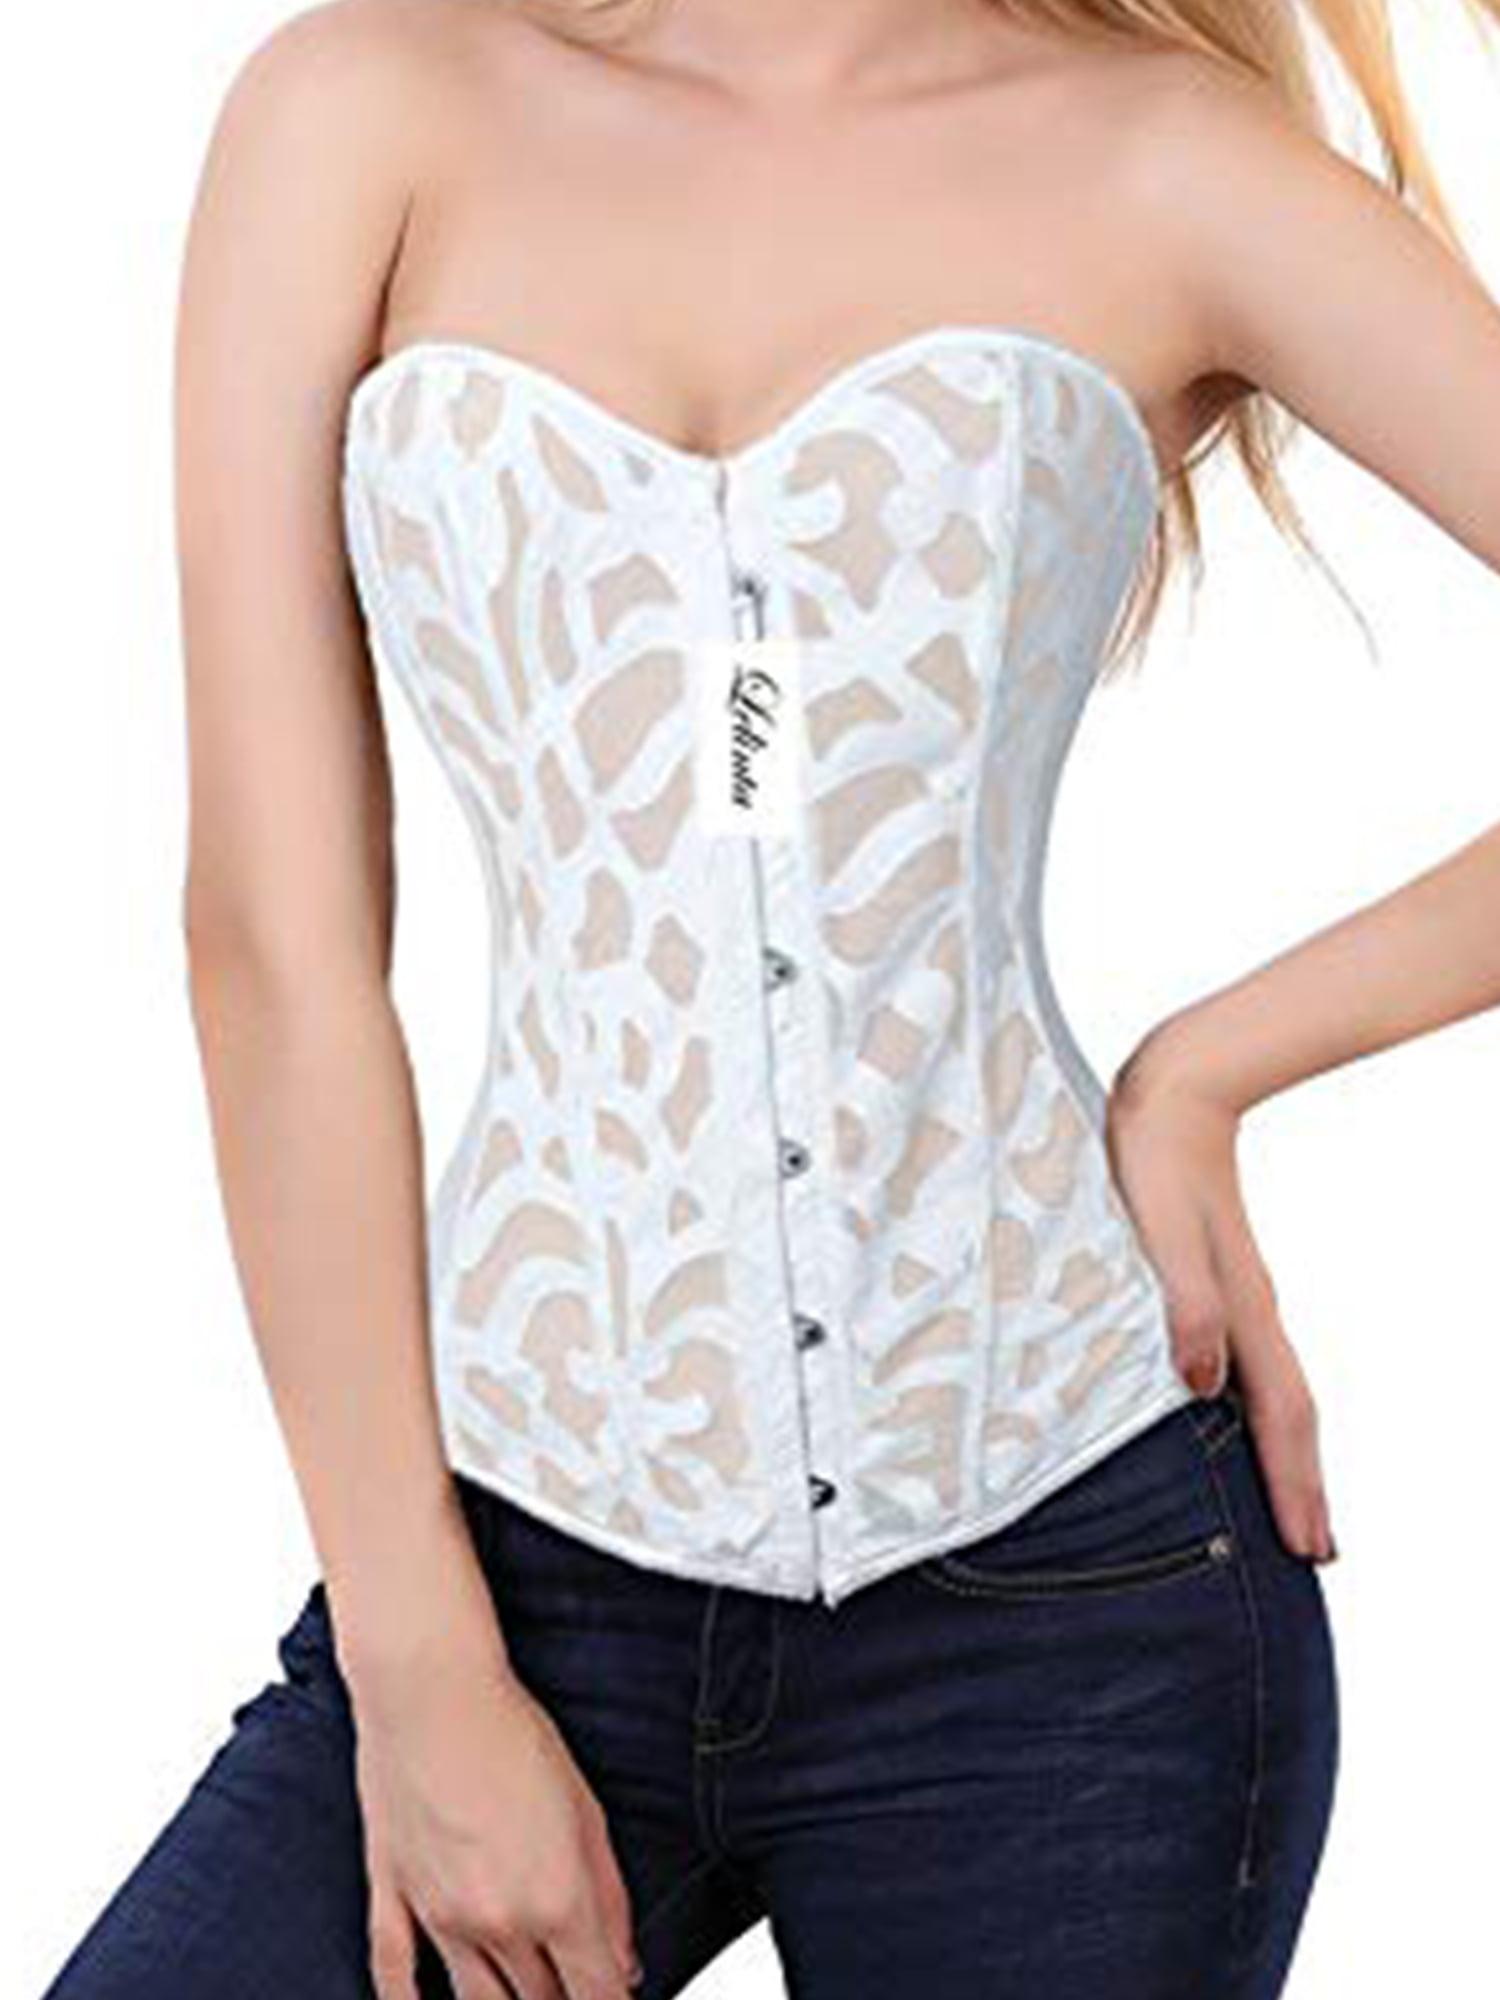 open cup corset size 36 boned